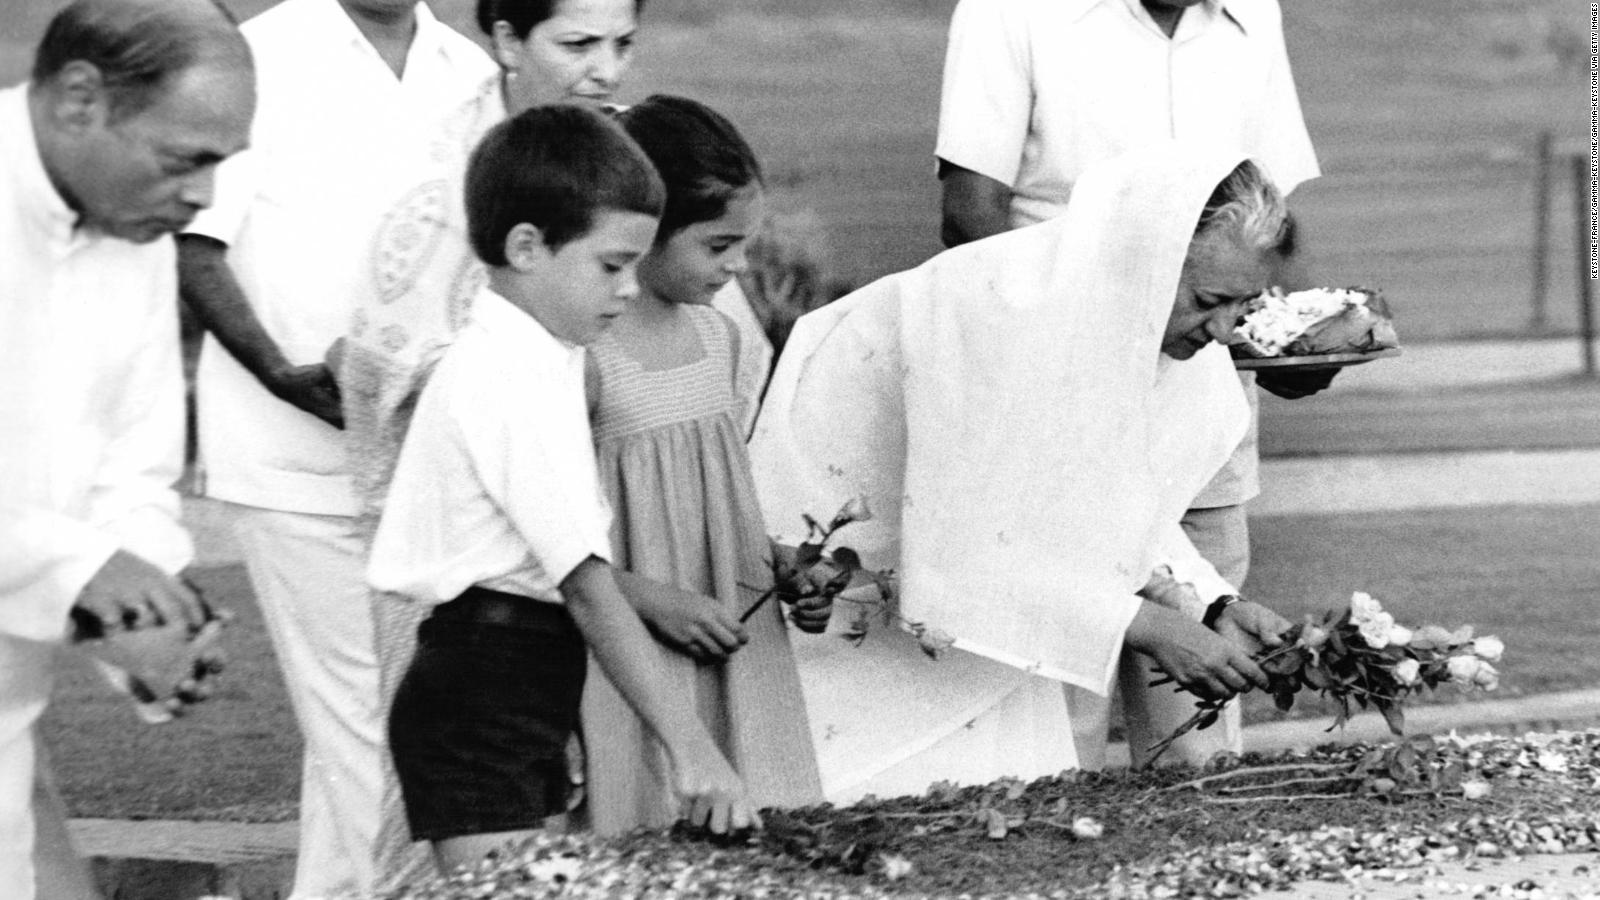 Siblings Rahul and Priyanka Gandhi accompany their grandmother, Indian Prime Minister Indira Gandhi, right, in Delhi on May 27, 1980.